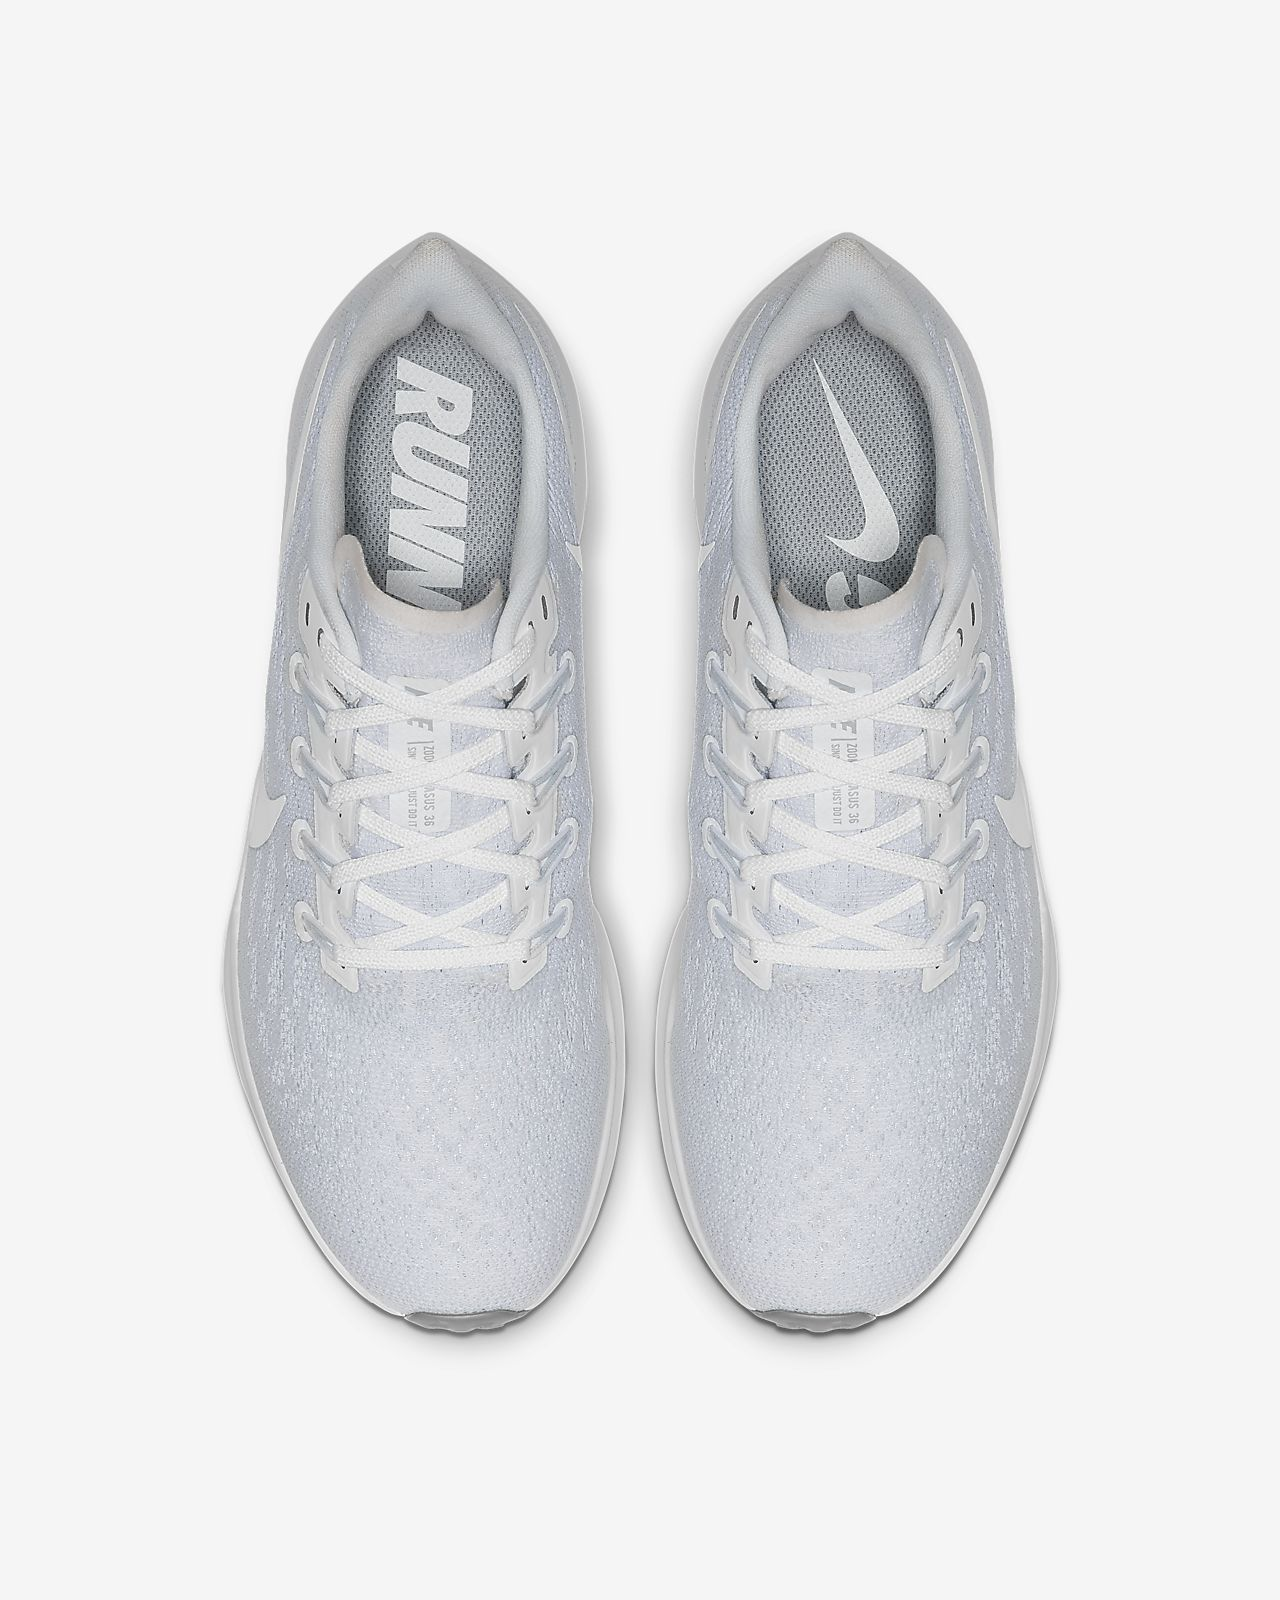 36 Shoe Women's Air Zoom Nike Running Pegasus xrCthQds